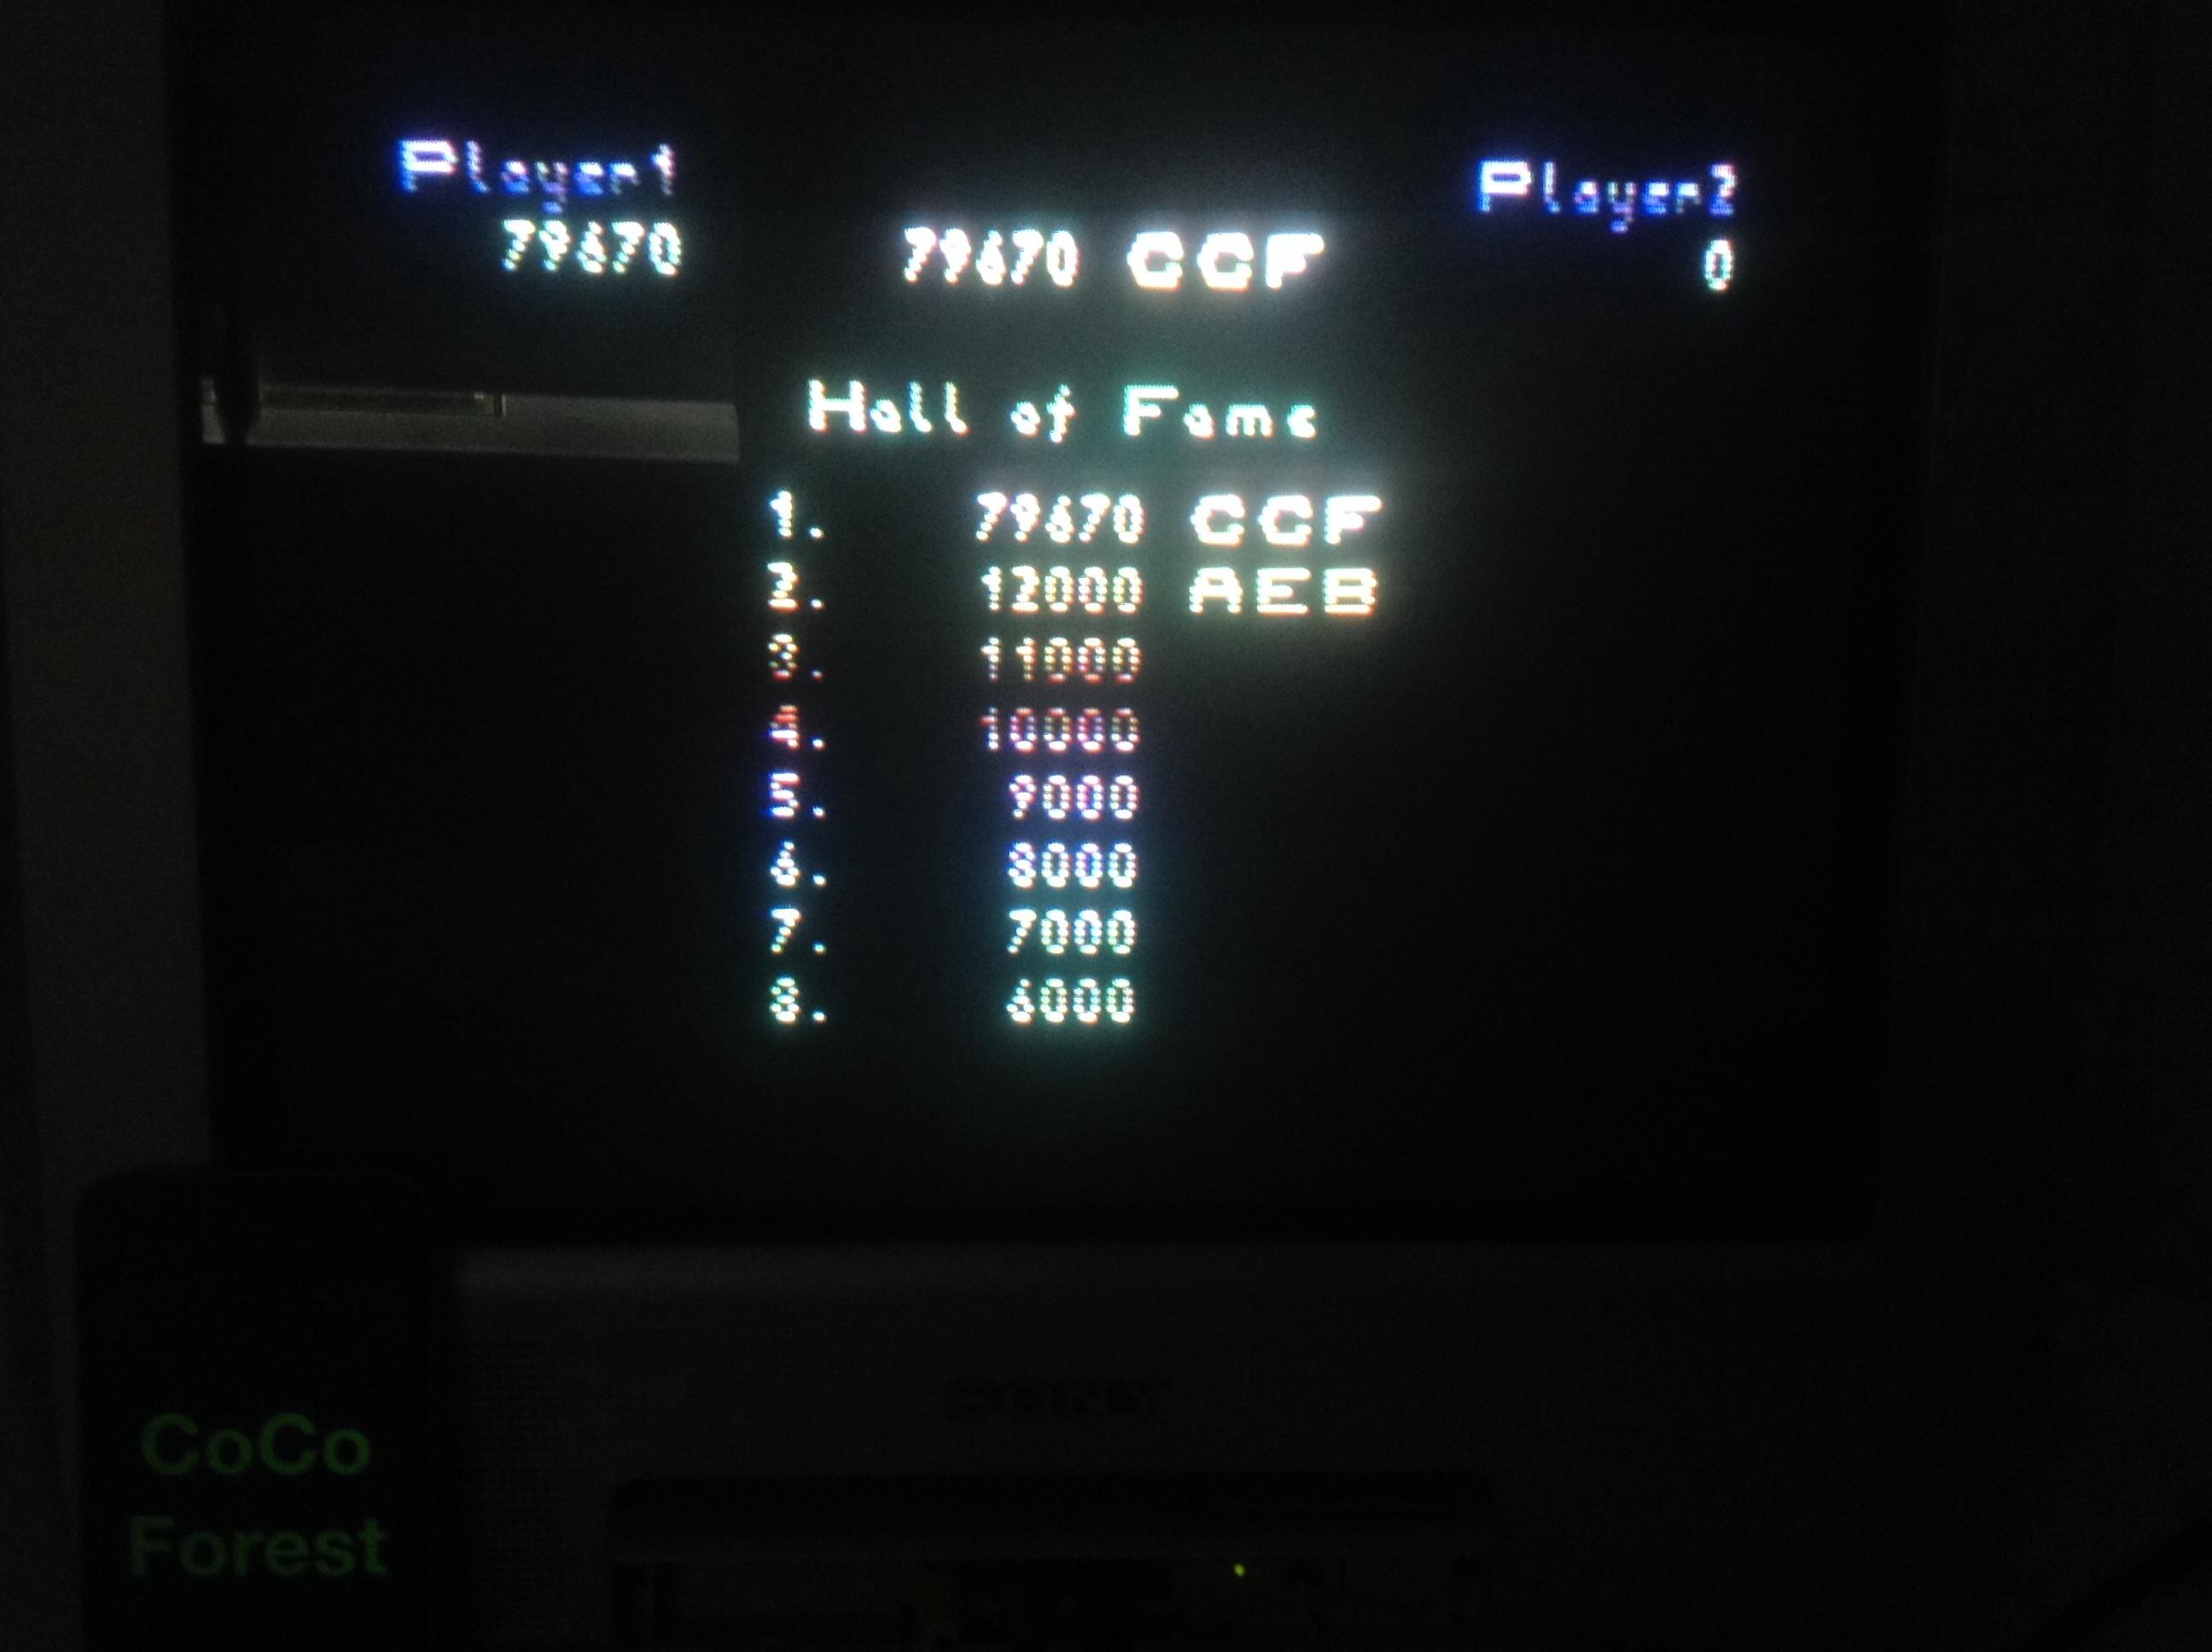 CoCoForest: Uridium (Commodore 64) 79,670 points on 2014-08-02 14:30:41